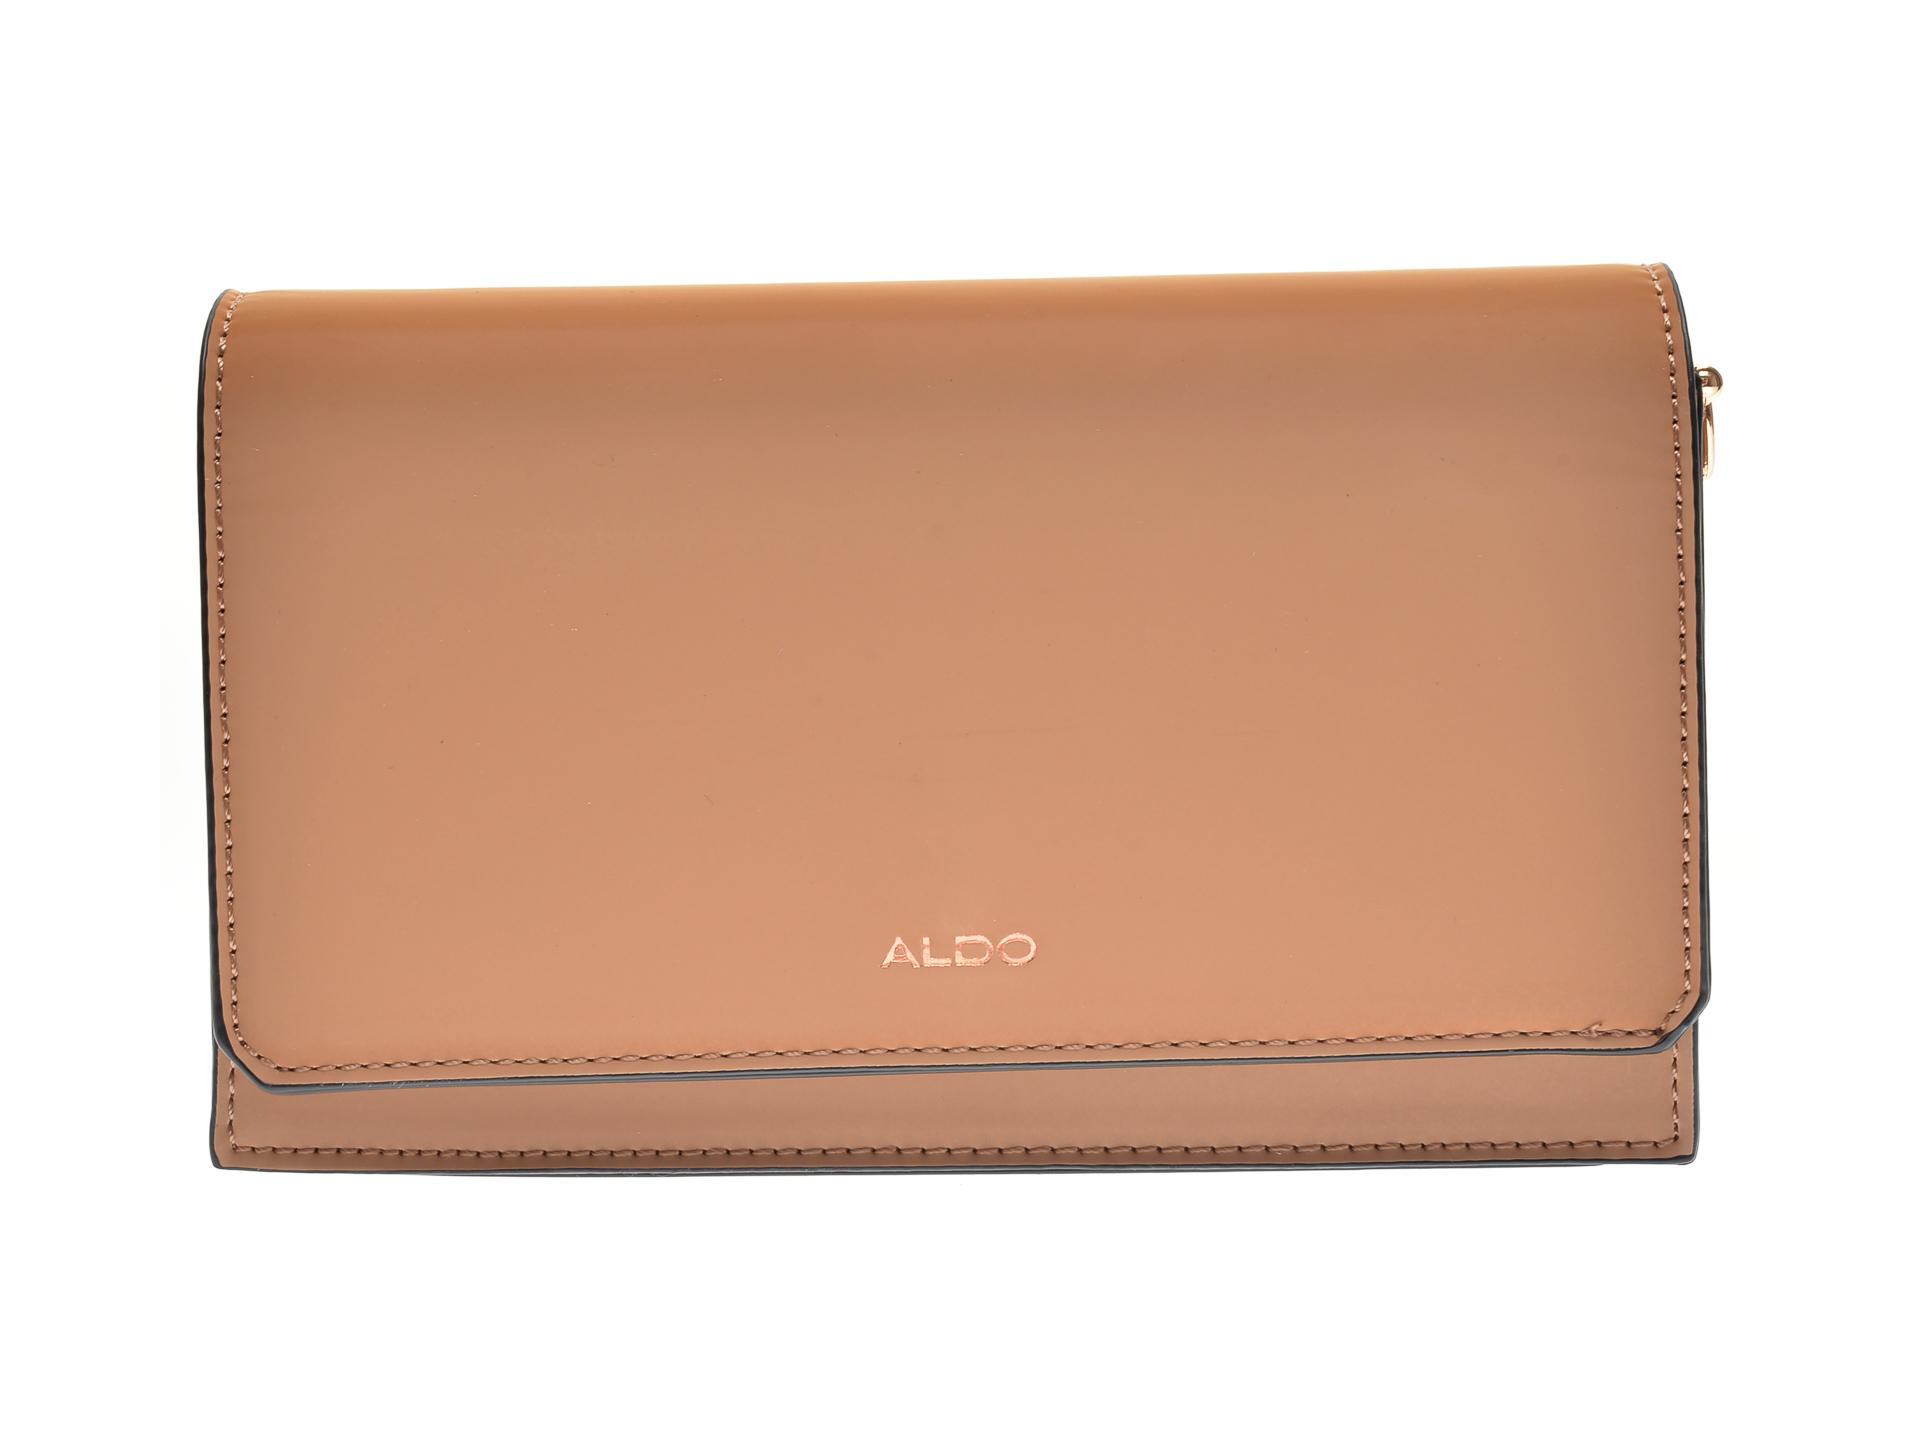 Poseta plic ALDO roz, Telopea651, din piele ecologica imagine otter.ro 2021